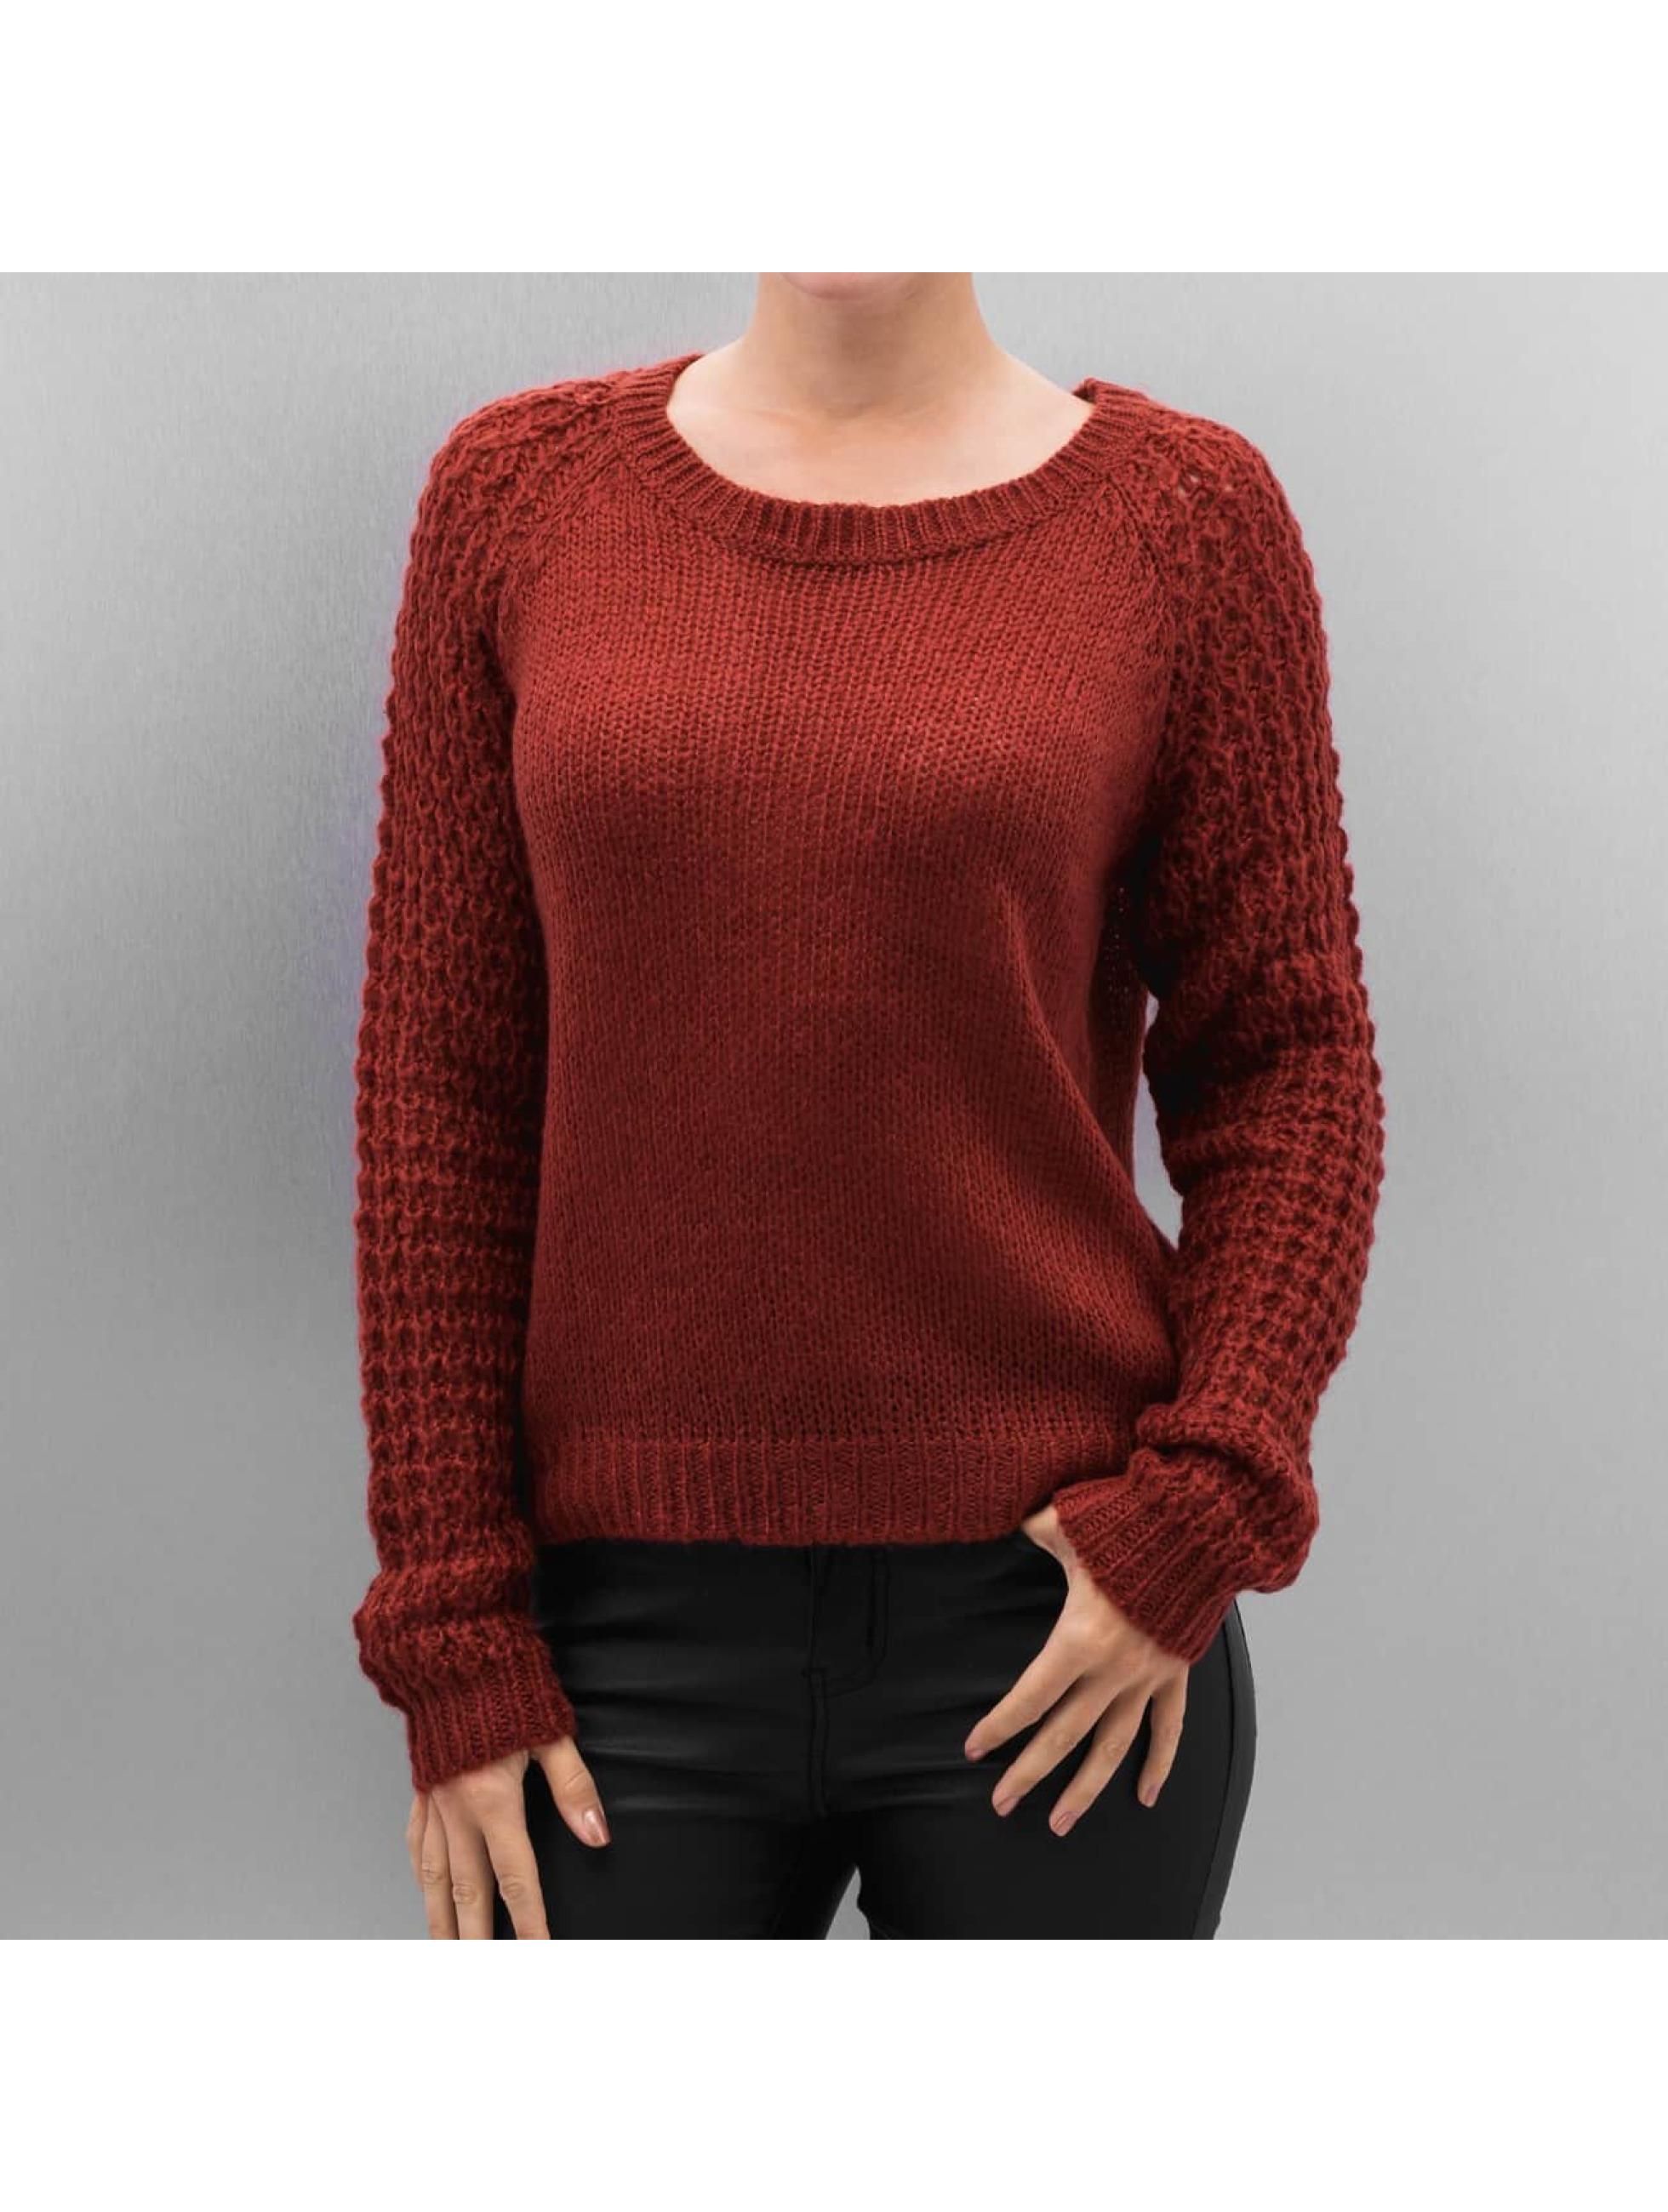 Vero Moda vmNorah Sweatshirt Fired Brick Sale Angebote Döbern